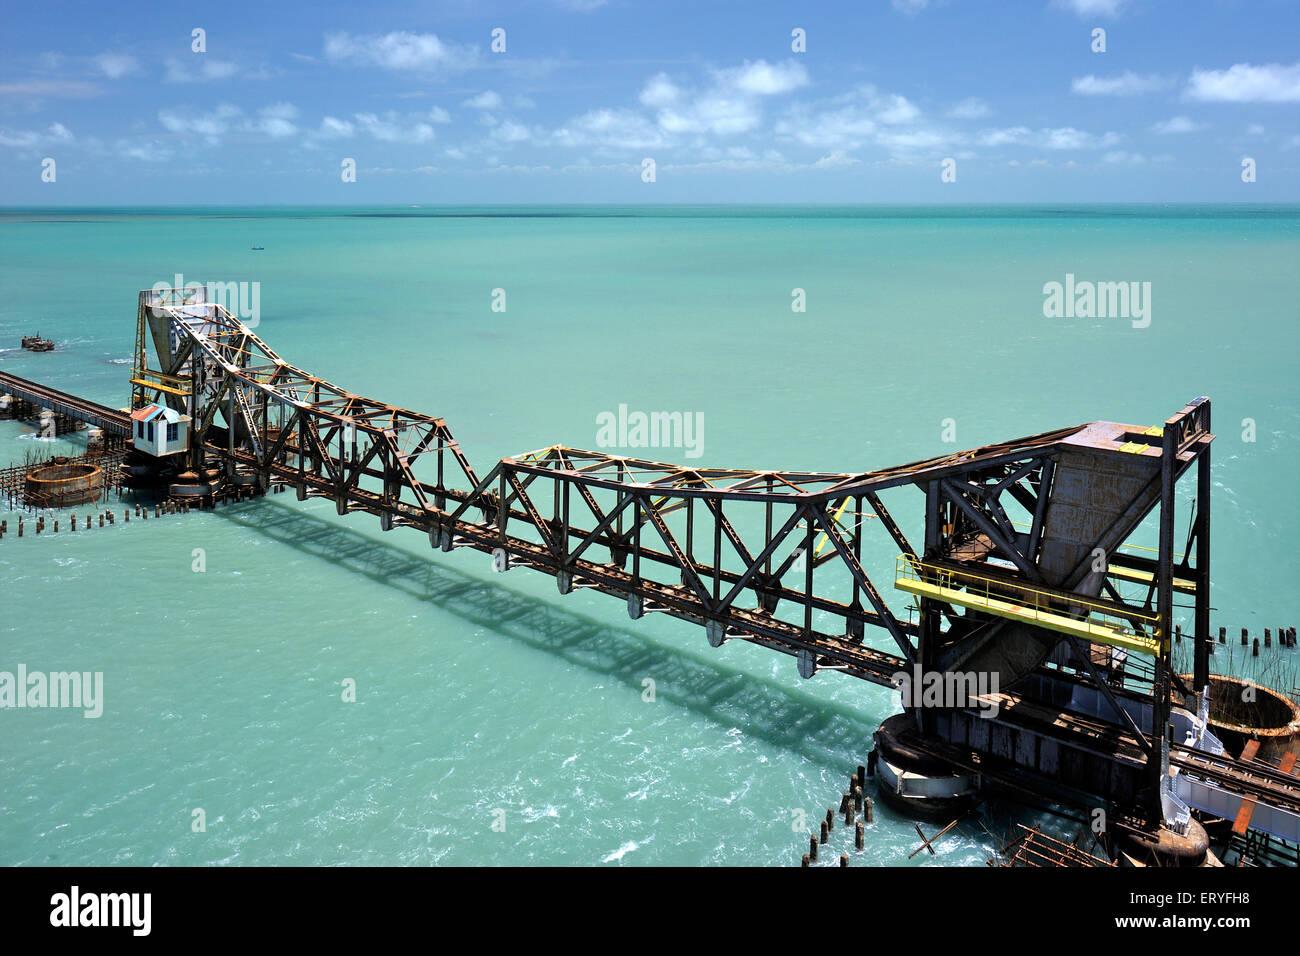 Longest railway pamban bridge on sea ; Rameswaram ; Tamil Nadu ; India - Stock Image